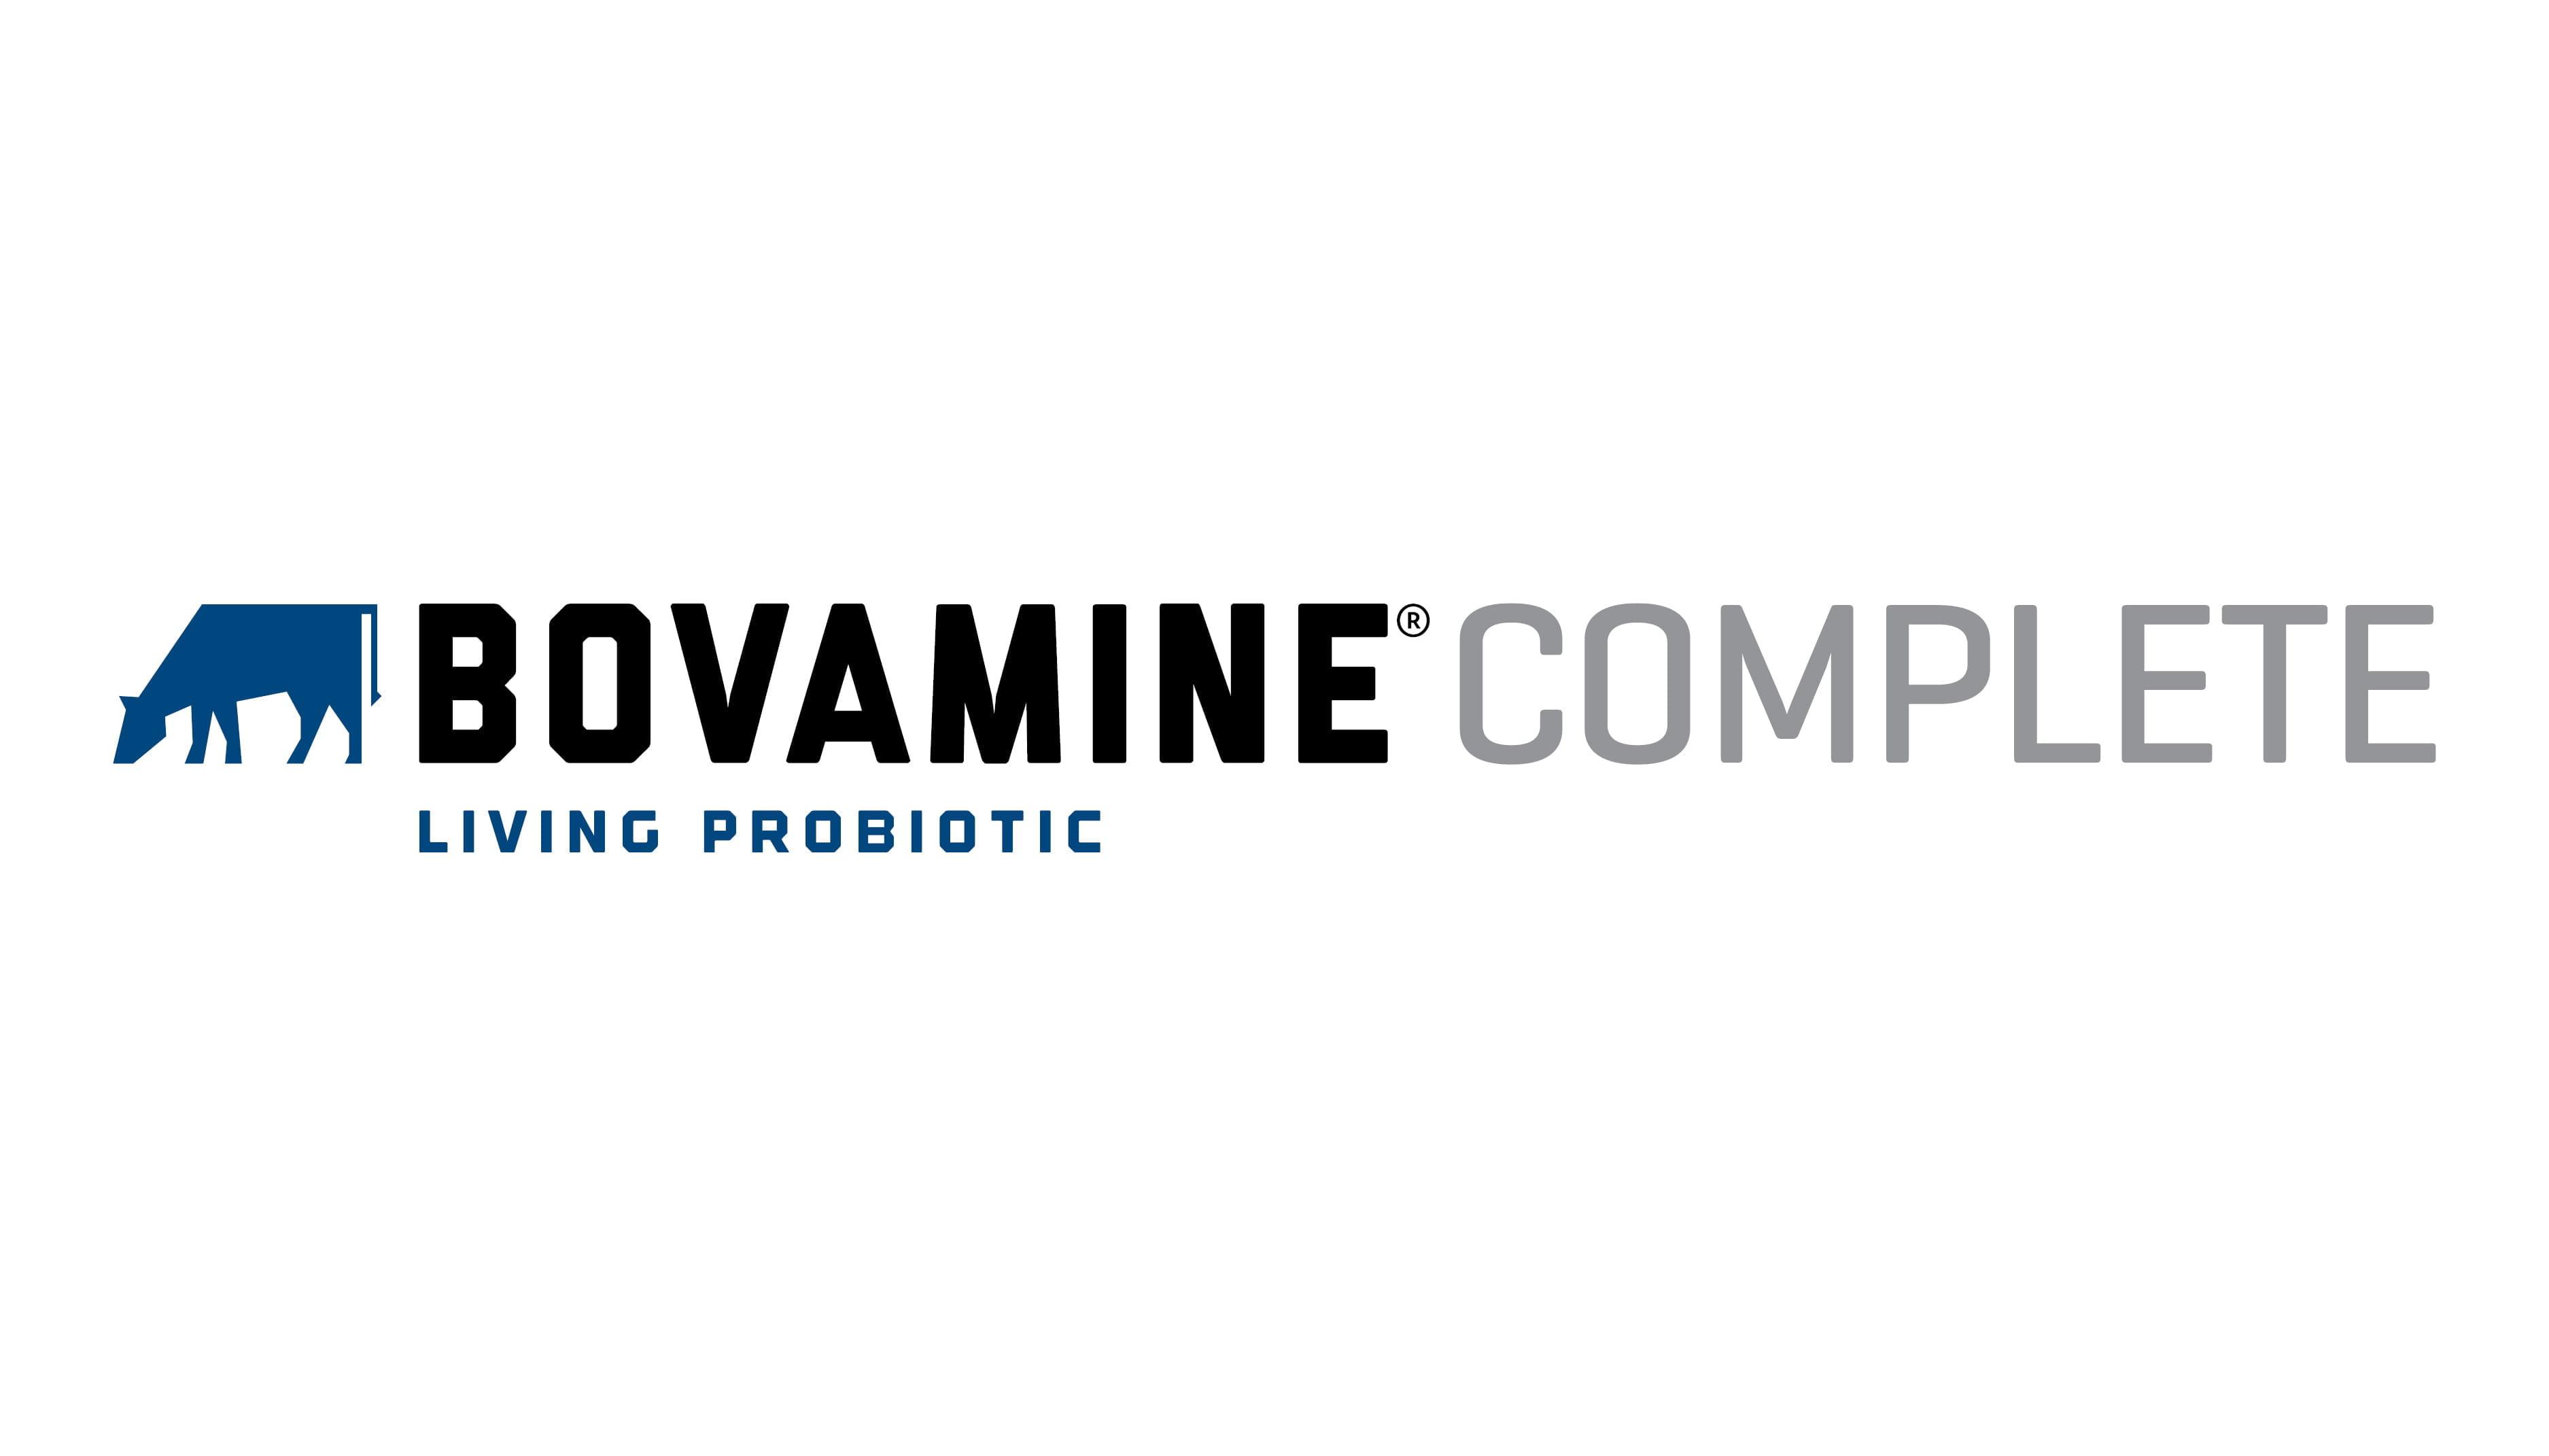 Bovamine complete